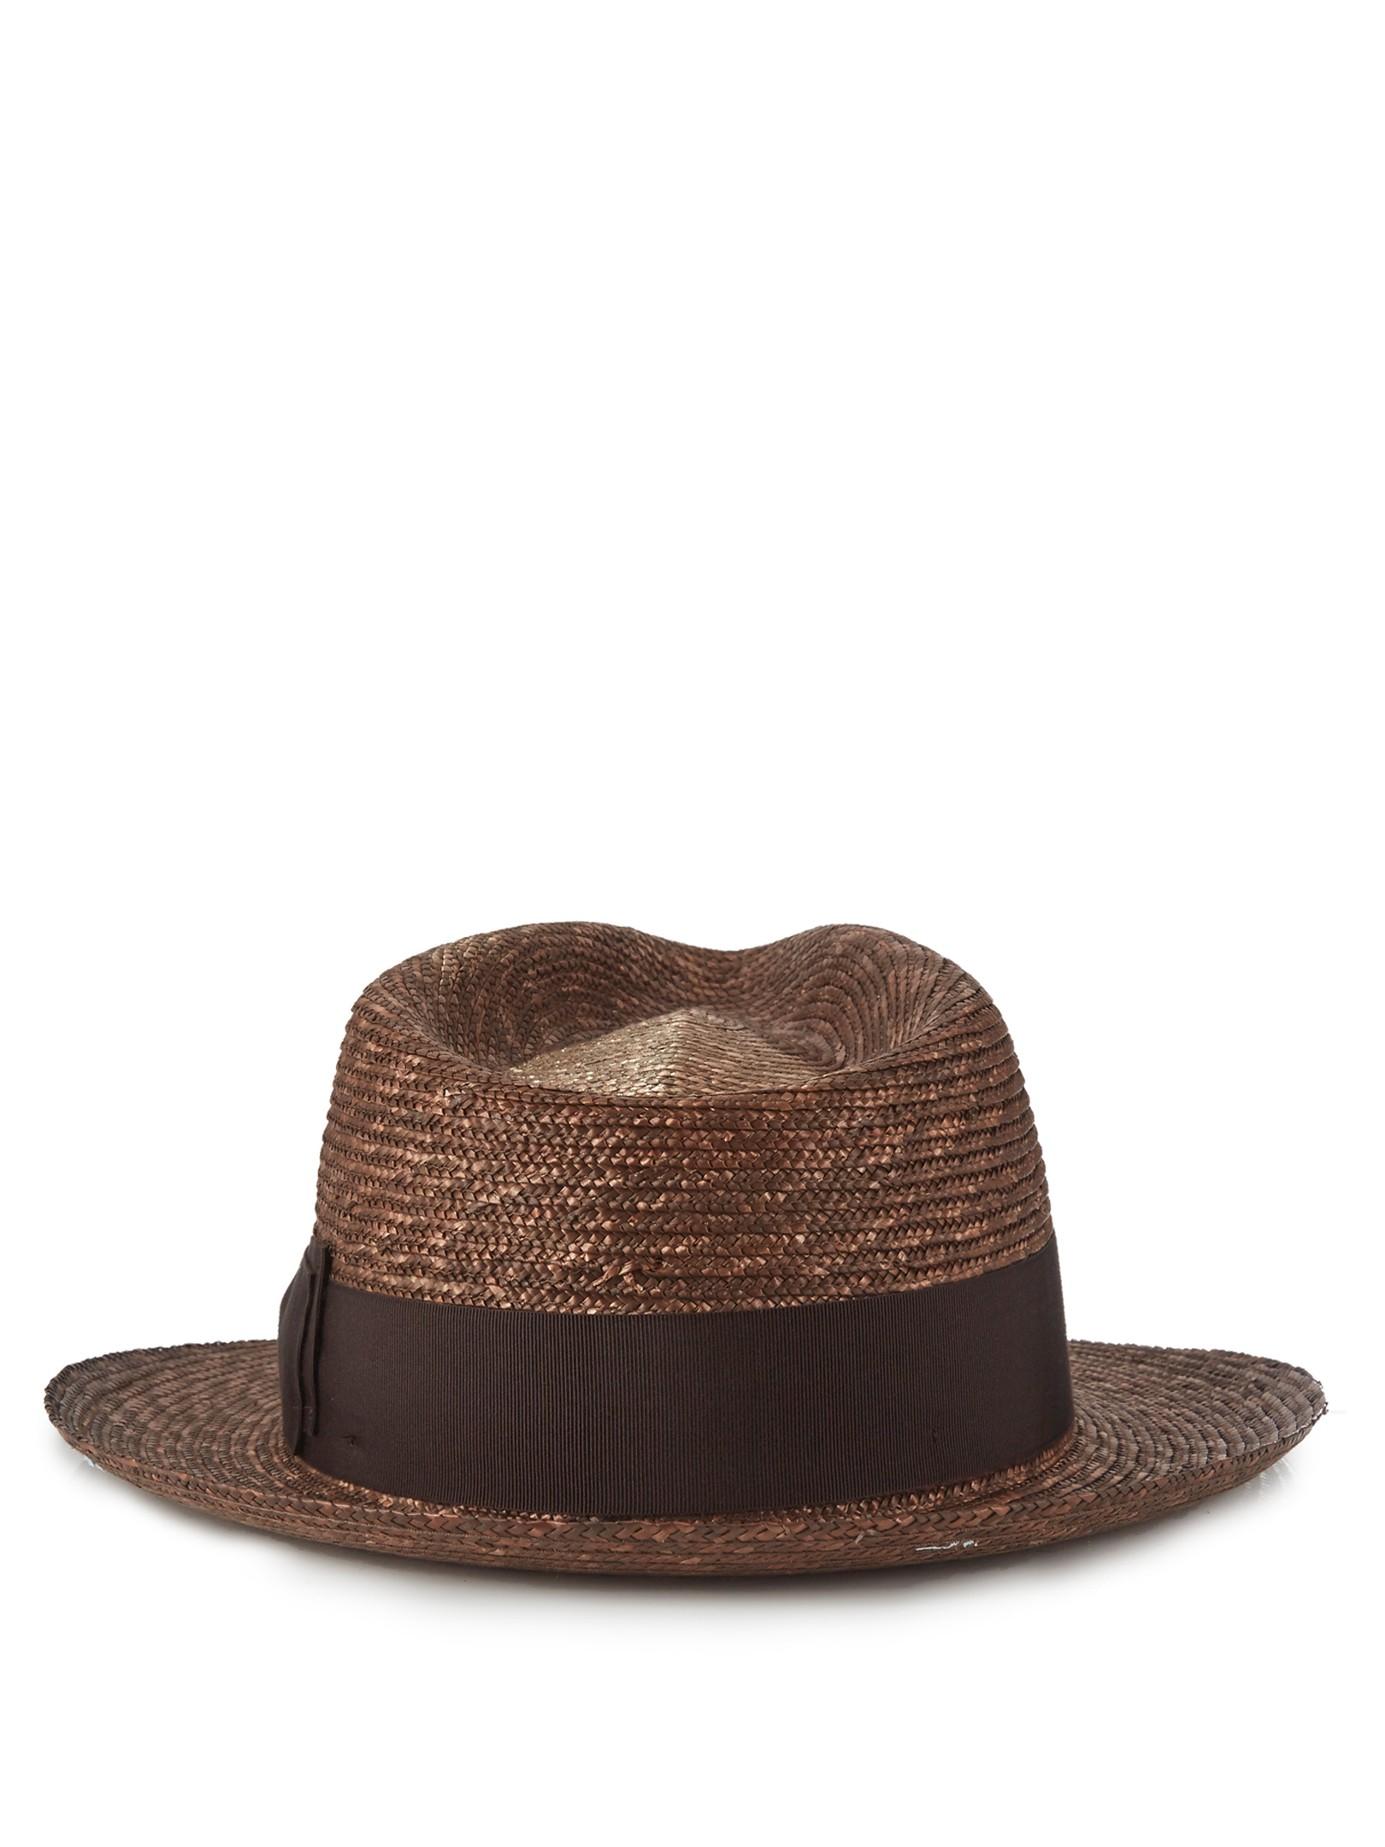 Black Brim Hat Fashion